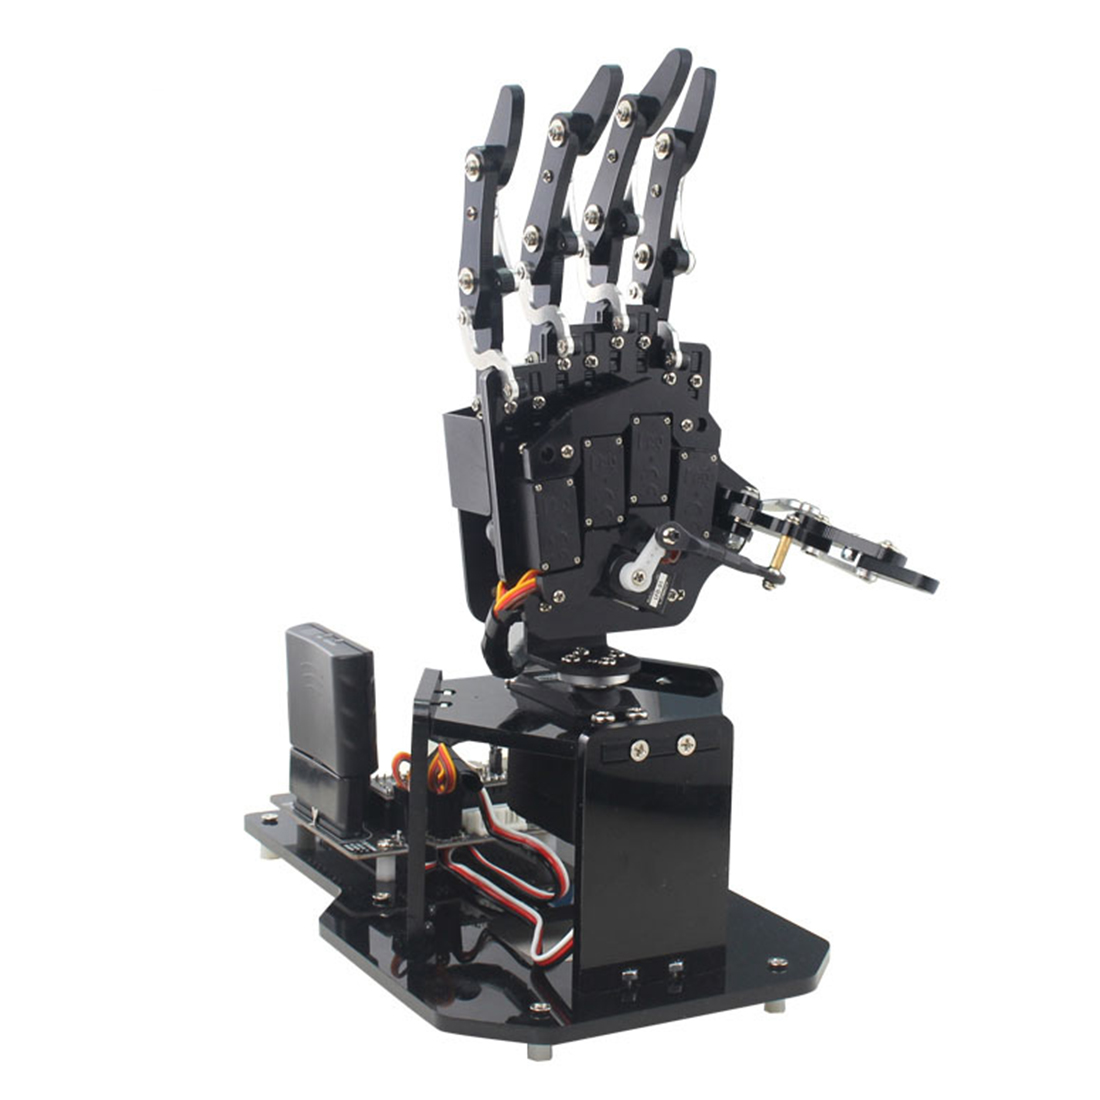 Open Source Robot Palm Bionic Mechanical Palm Sense Maker For Arduino Brain-Training Toy Children Educational Toys Birthday Gift